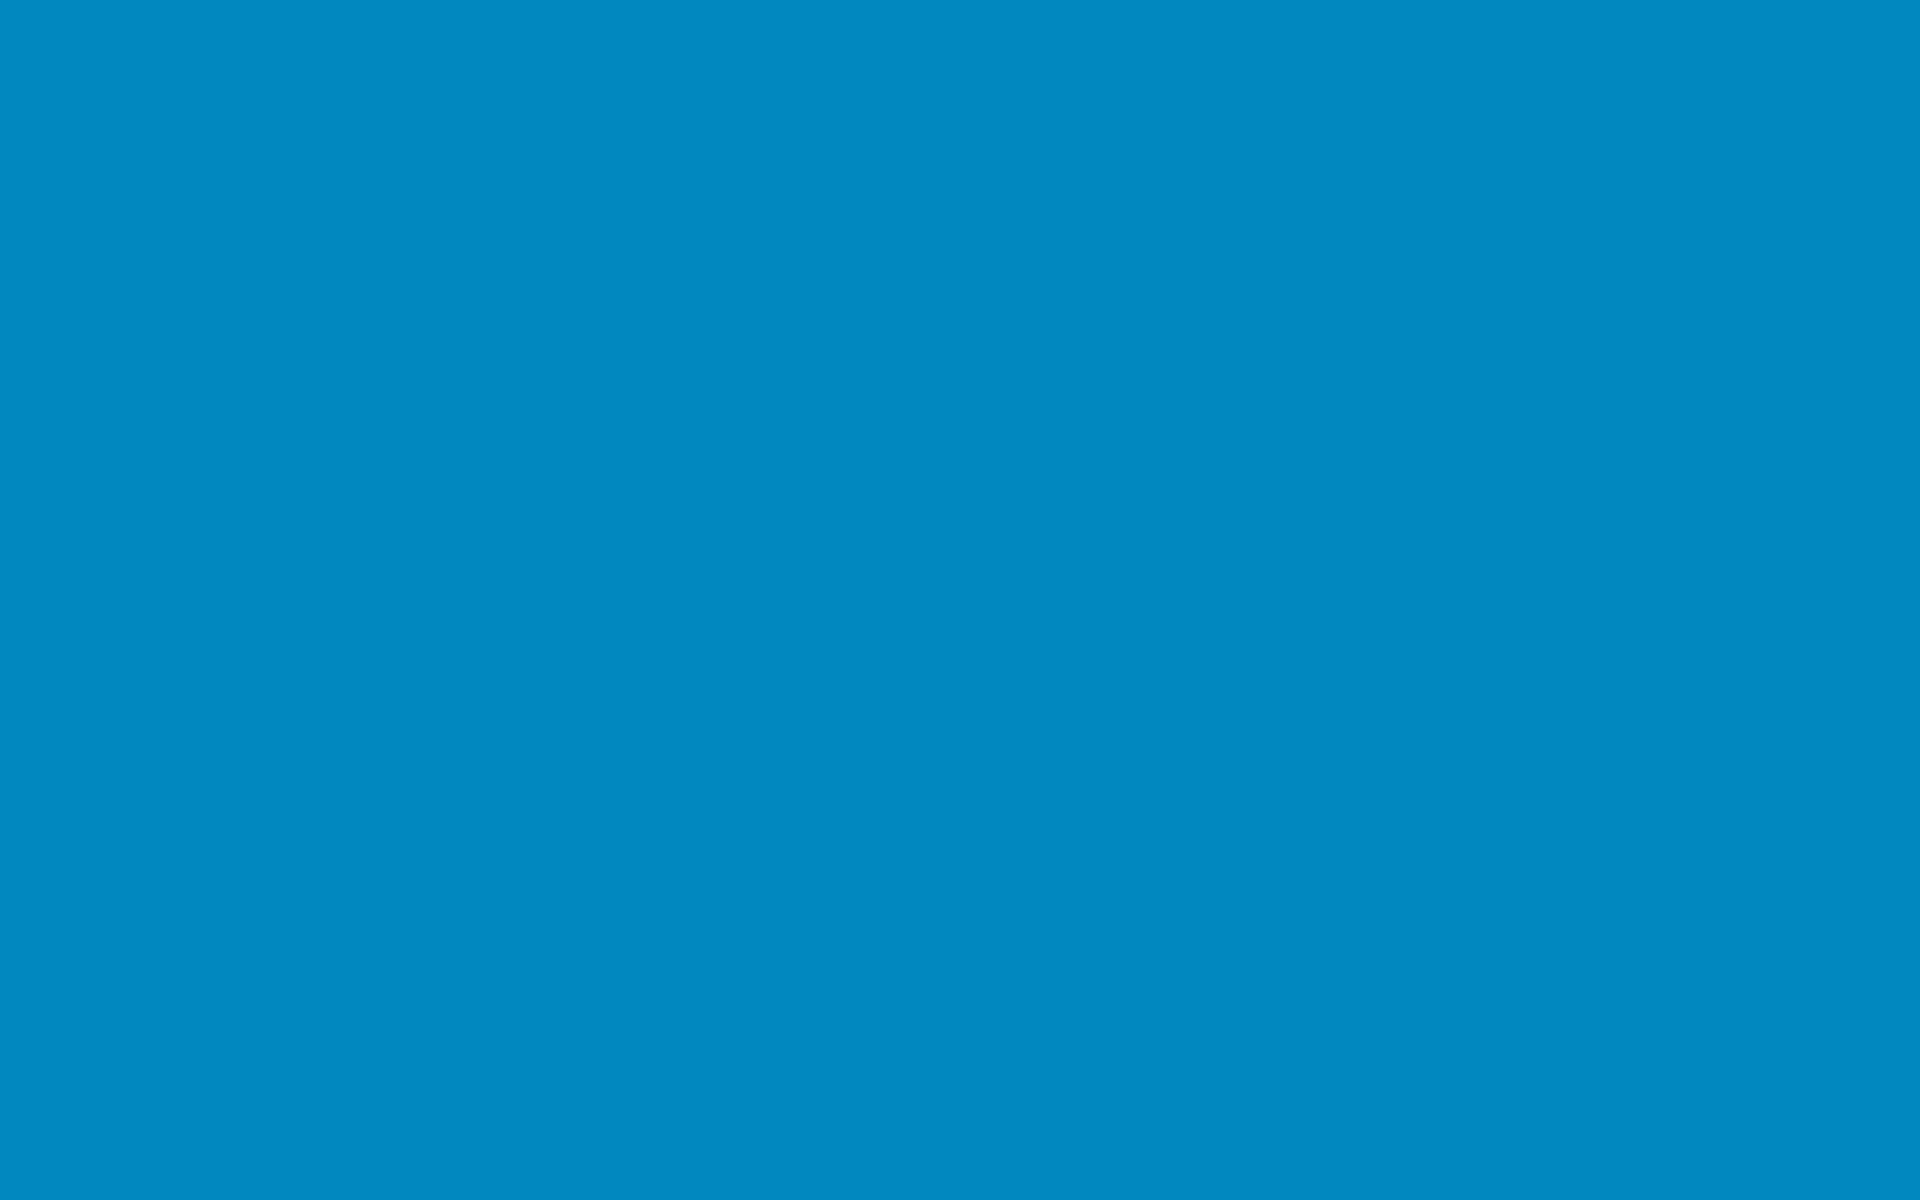 1920x1200 Blue NCS Solid Color Background